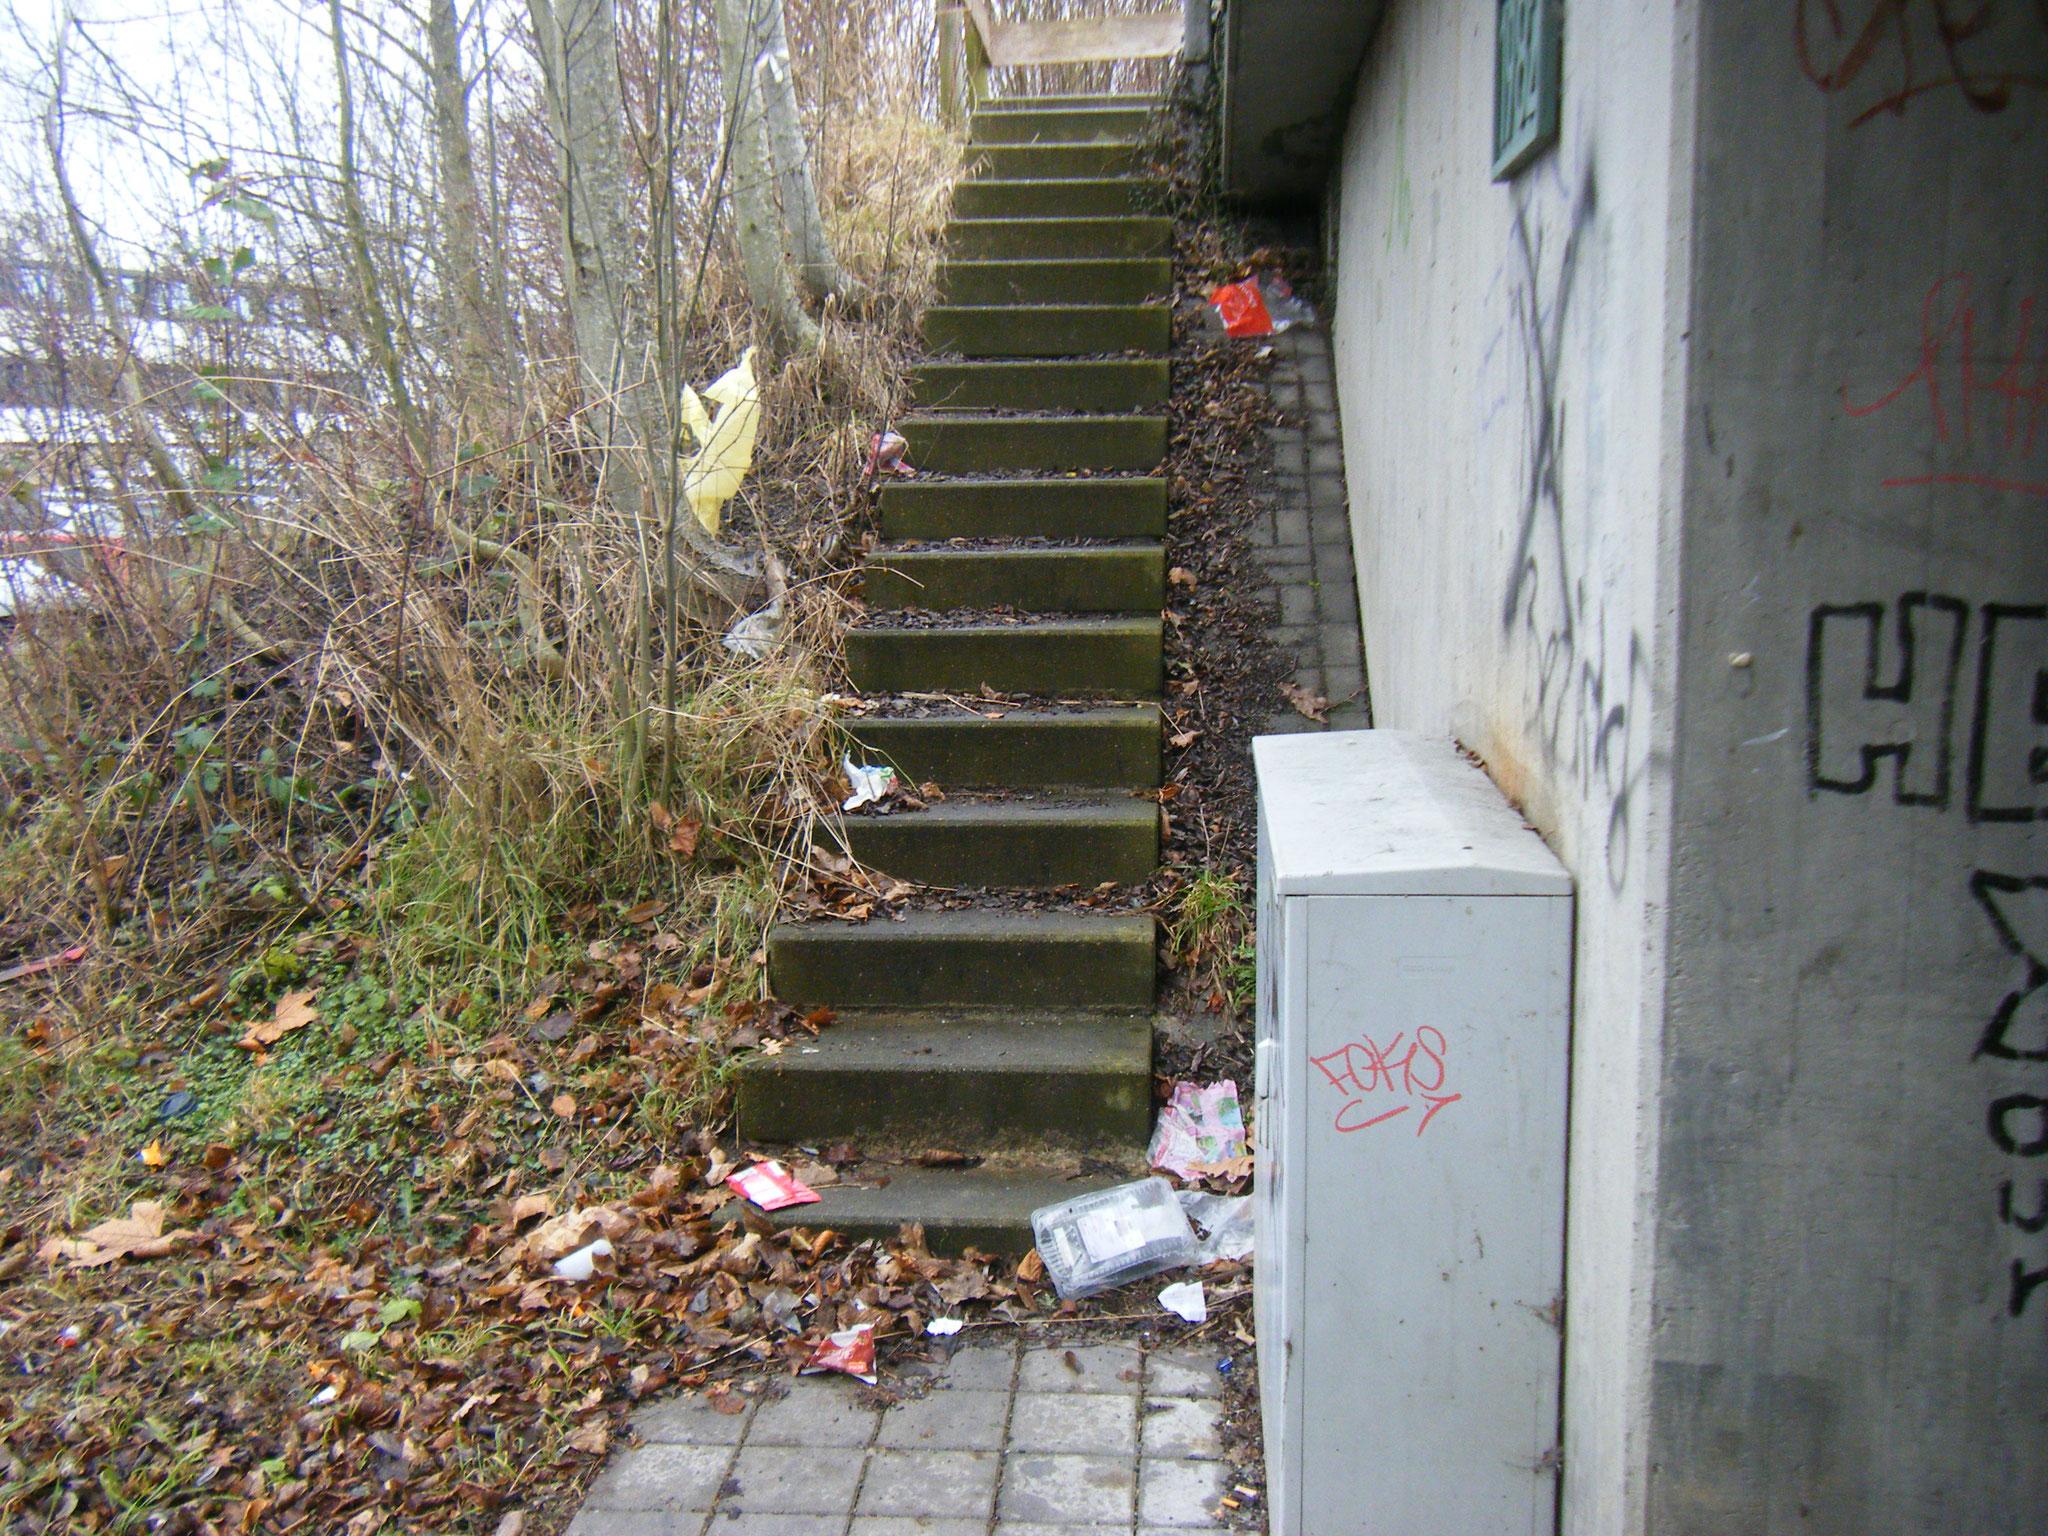 alle Treppen neben den Brücken sind völlig vermüllt